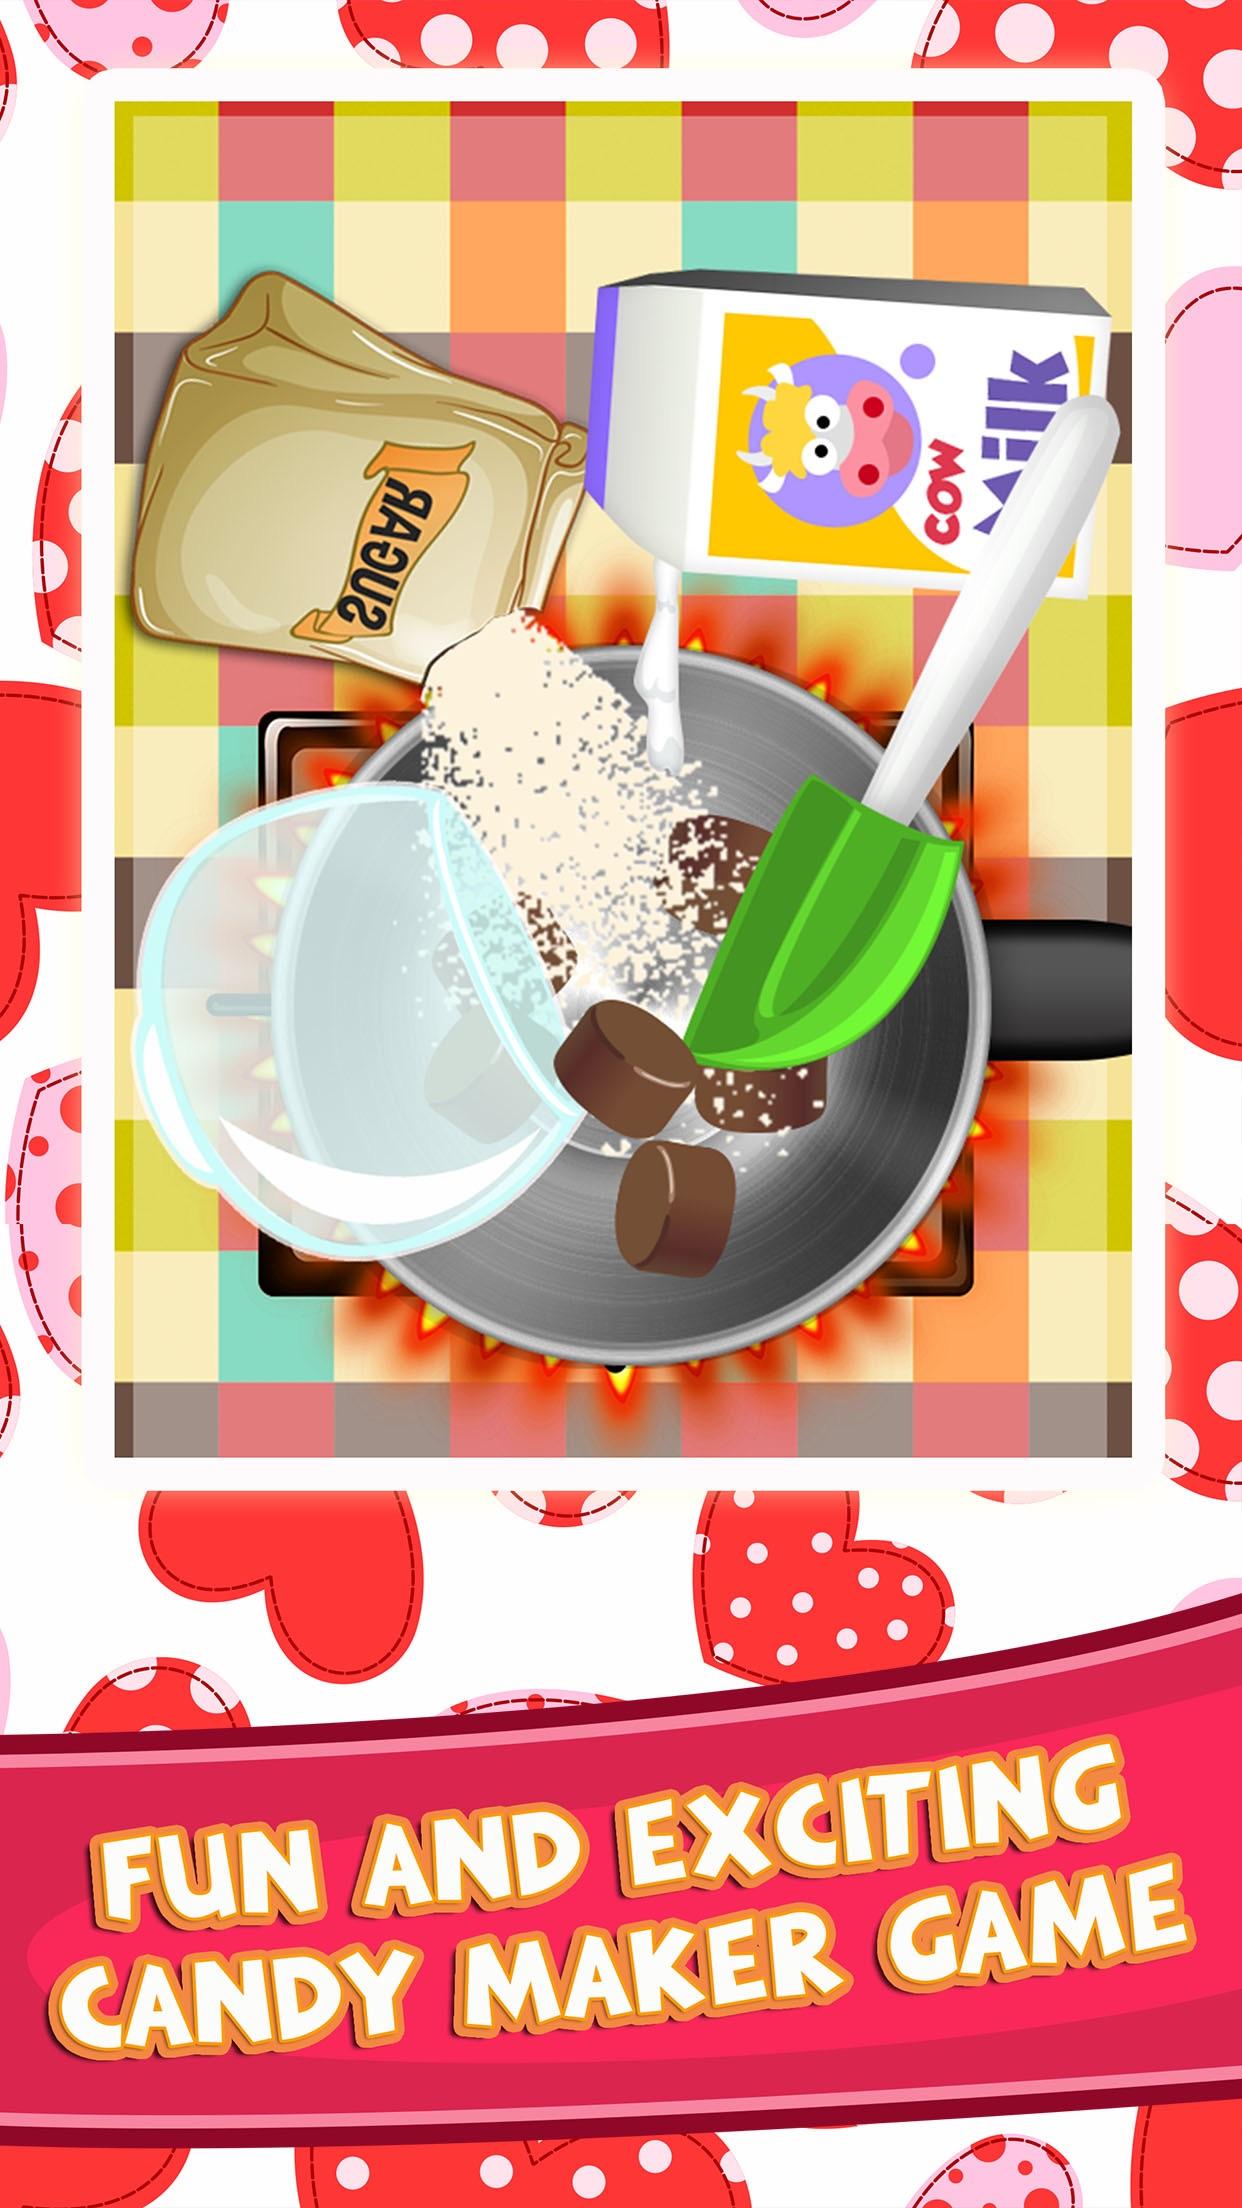 Candy Dessert Making Food Games for Kids Screenshot